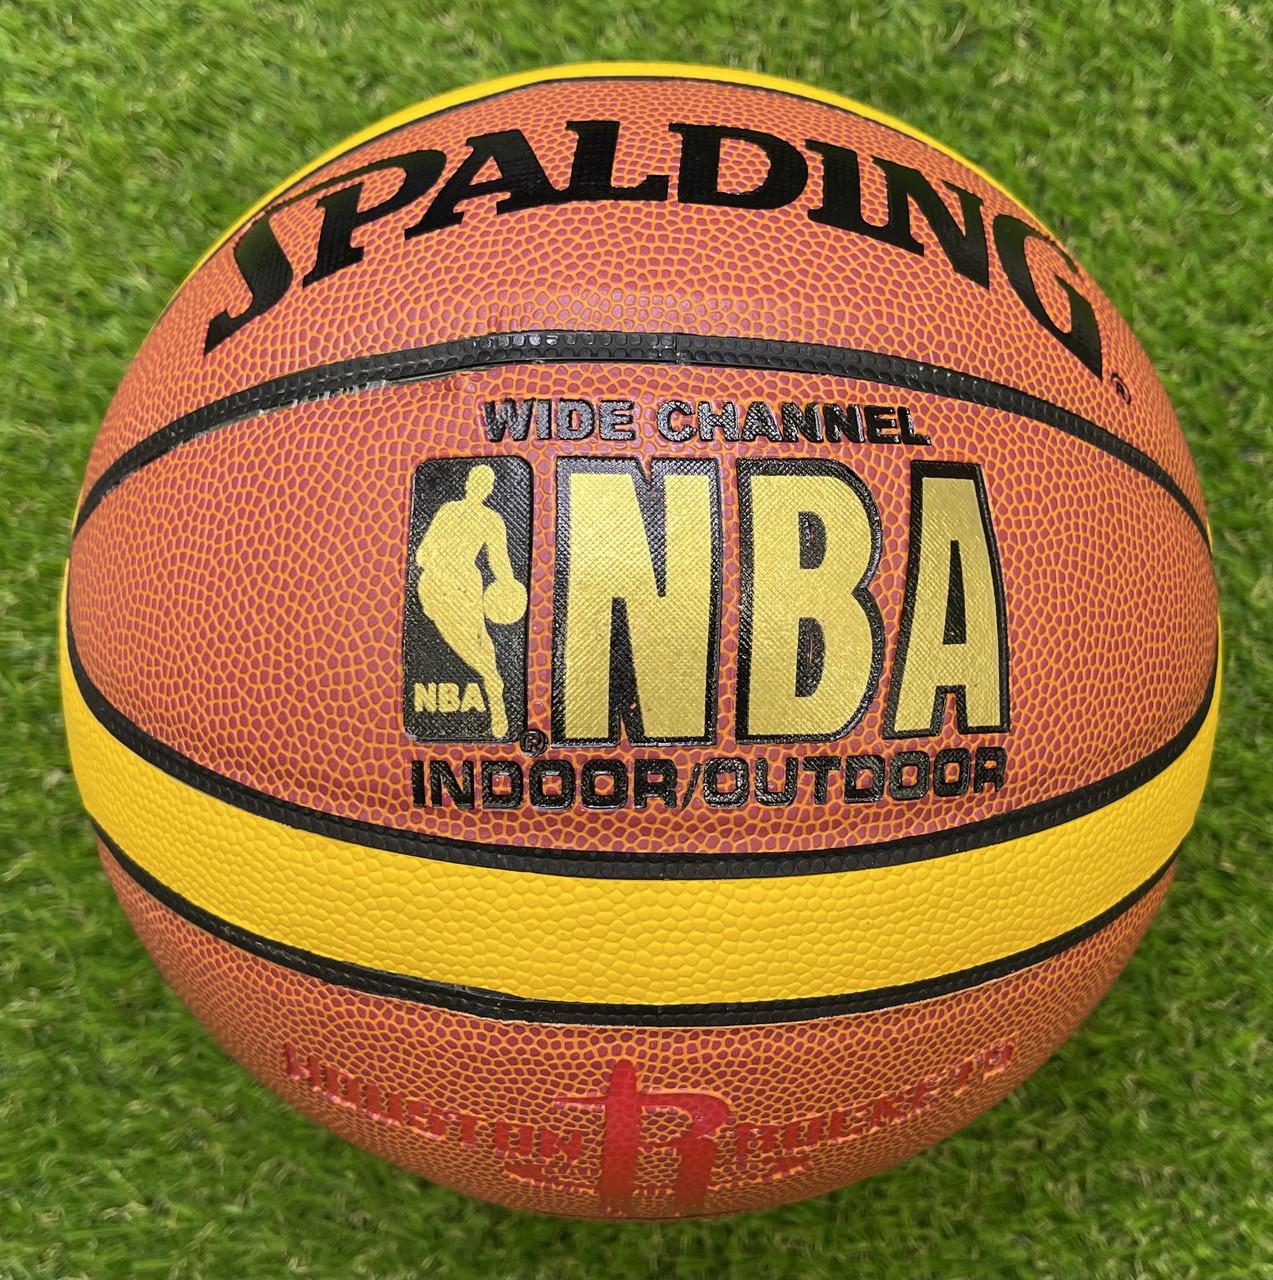 М'яч баскетбольний Spald PVC7 WideChannel King